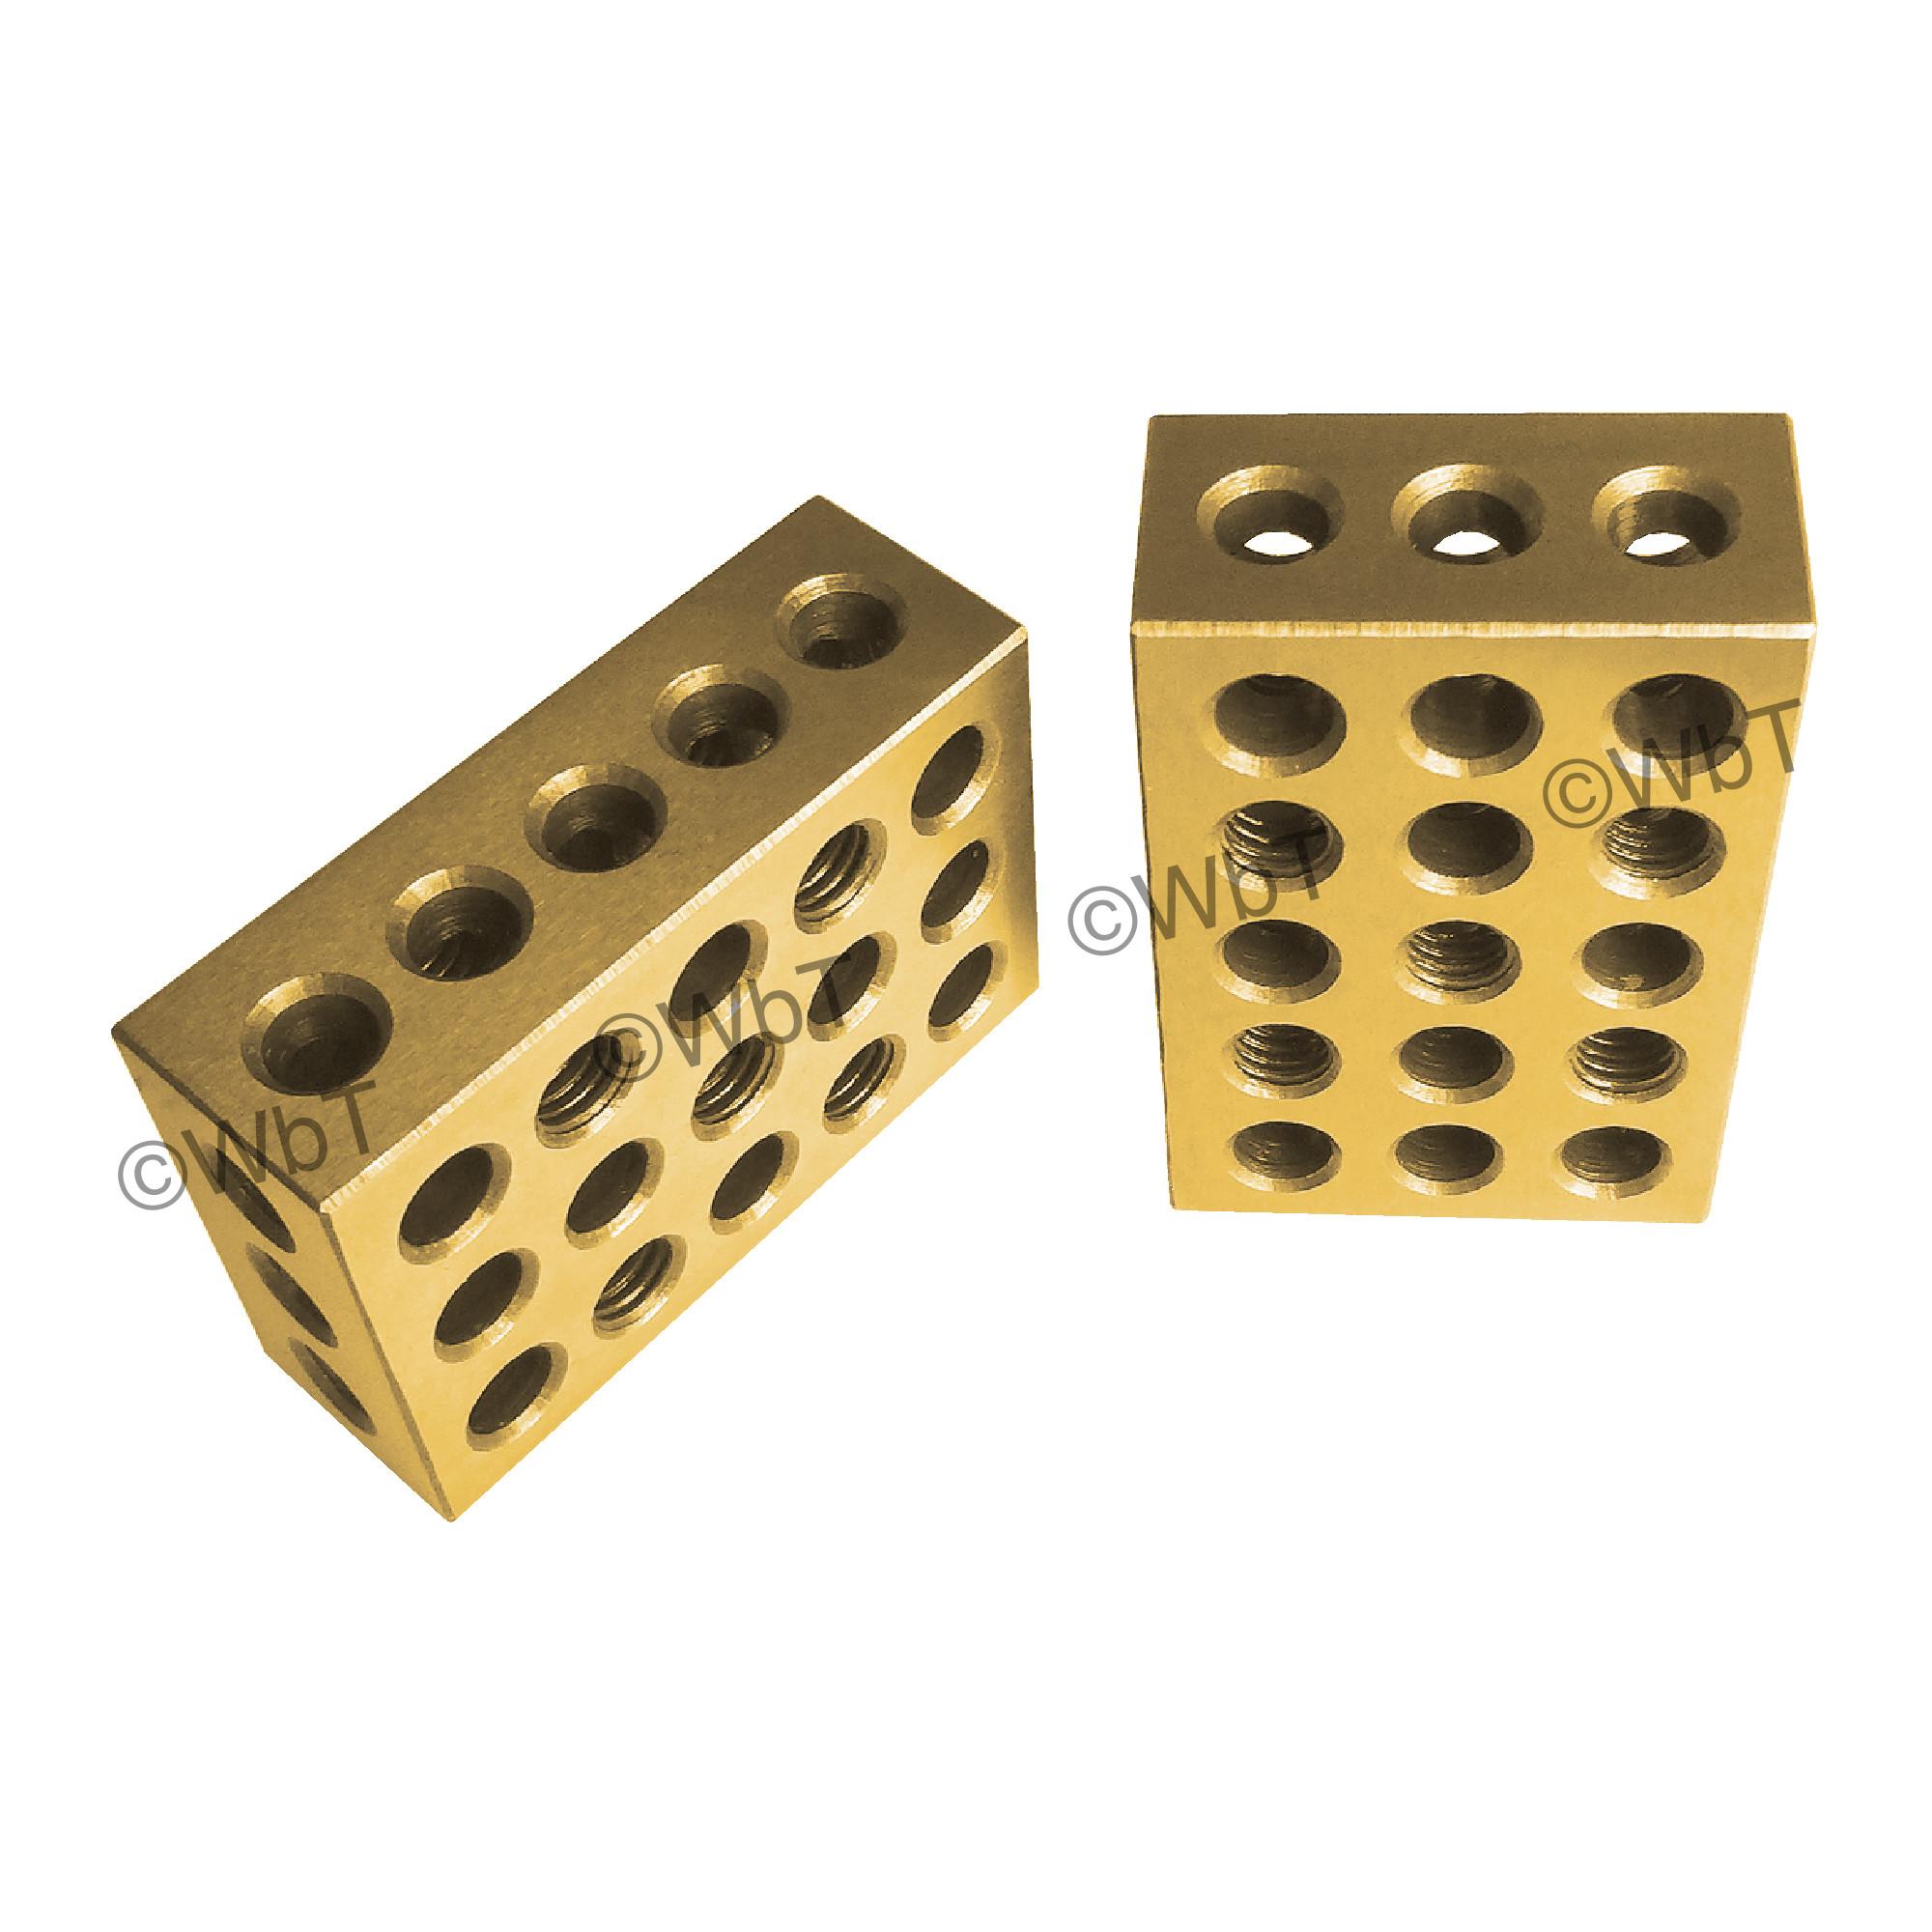 TiN Coated 1-2-3 Block Set